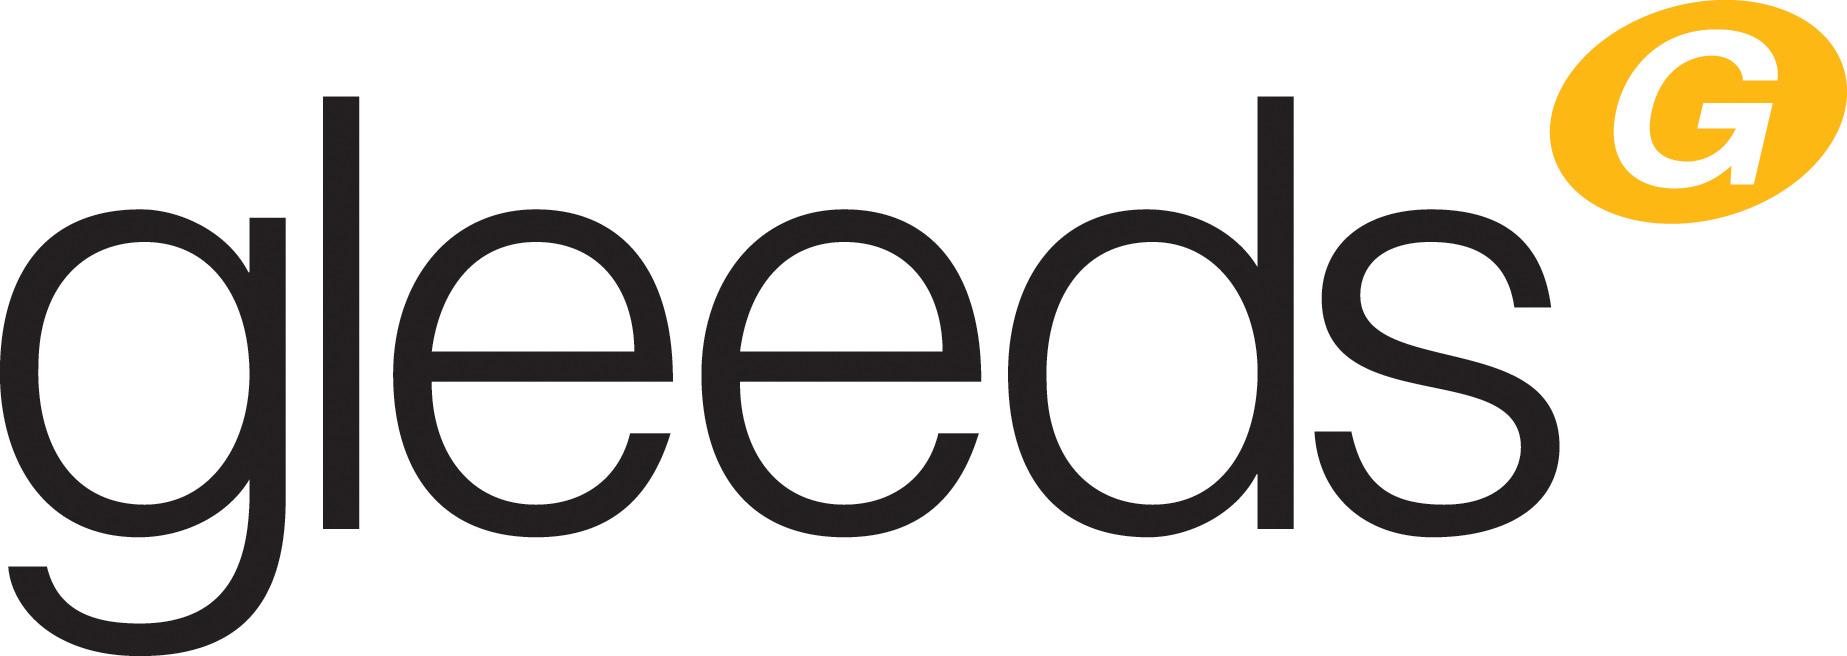 9_4_Gleeds_logo_2_7_for_web